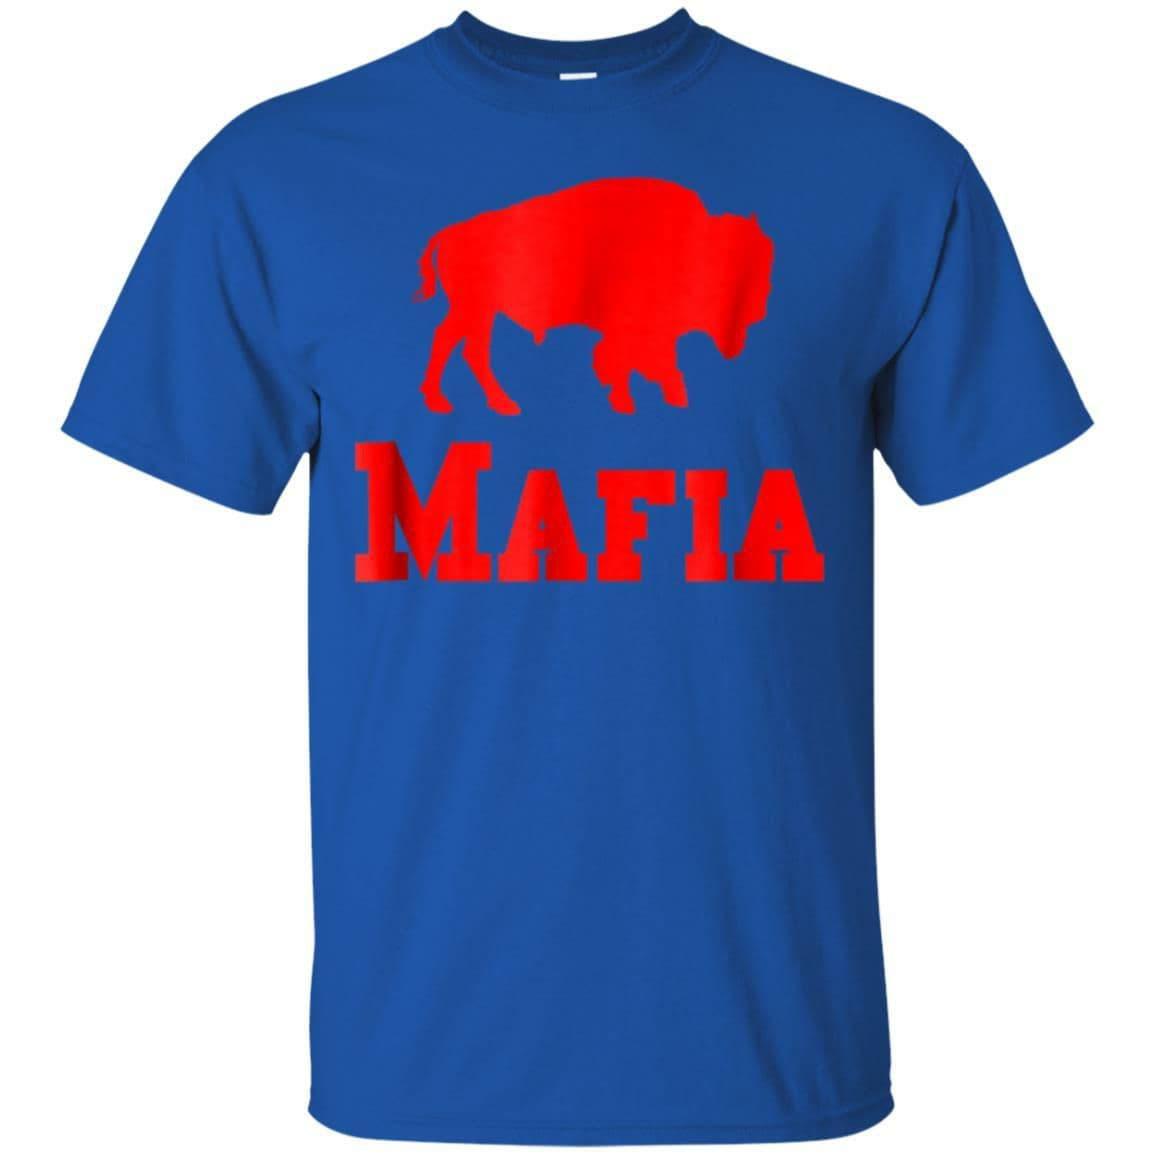 MAFIA NEW TSHIRT 😍😍😍 BUYING SOURCE :   #BuffaloBills #BillsMafia #billsnation #billsgeard #afcchampionship #NFL #NHL #Bills #Mafia #johnallen